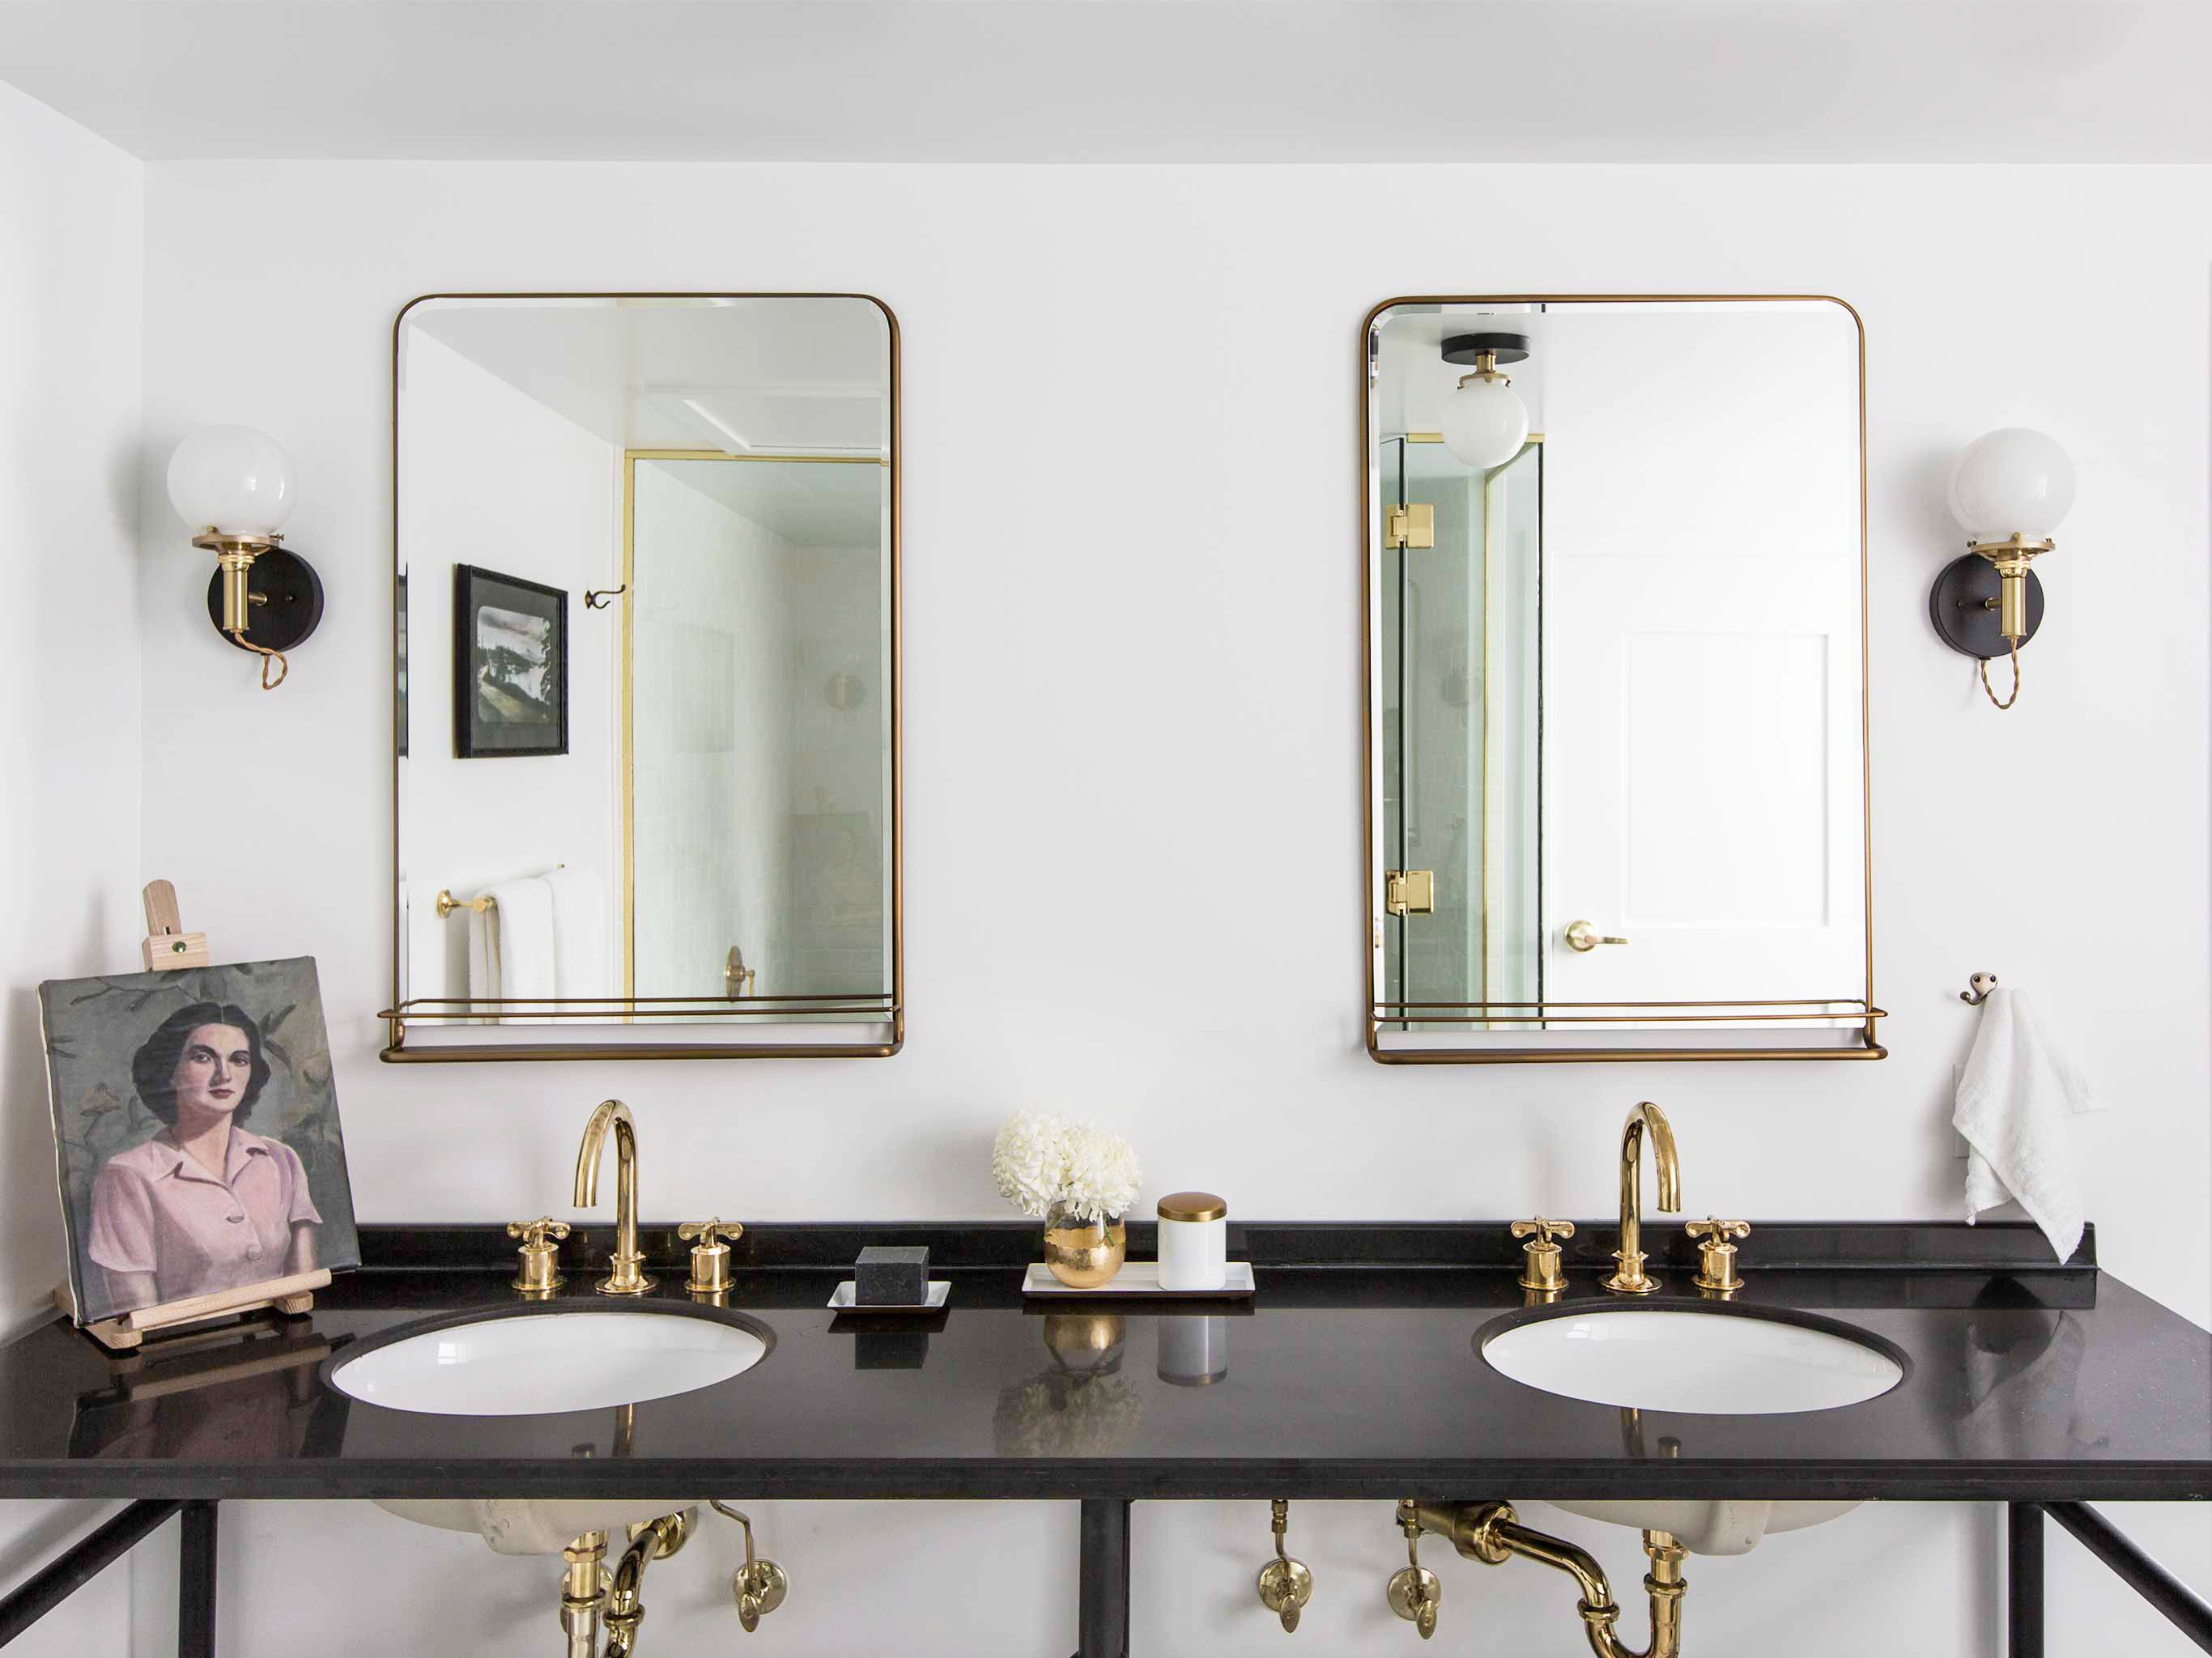 21 Organization Tricks to Make Your Bathroom Feel Twice as Big